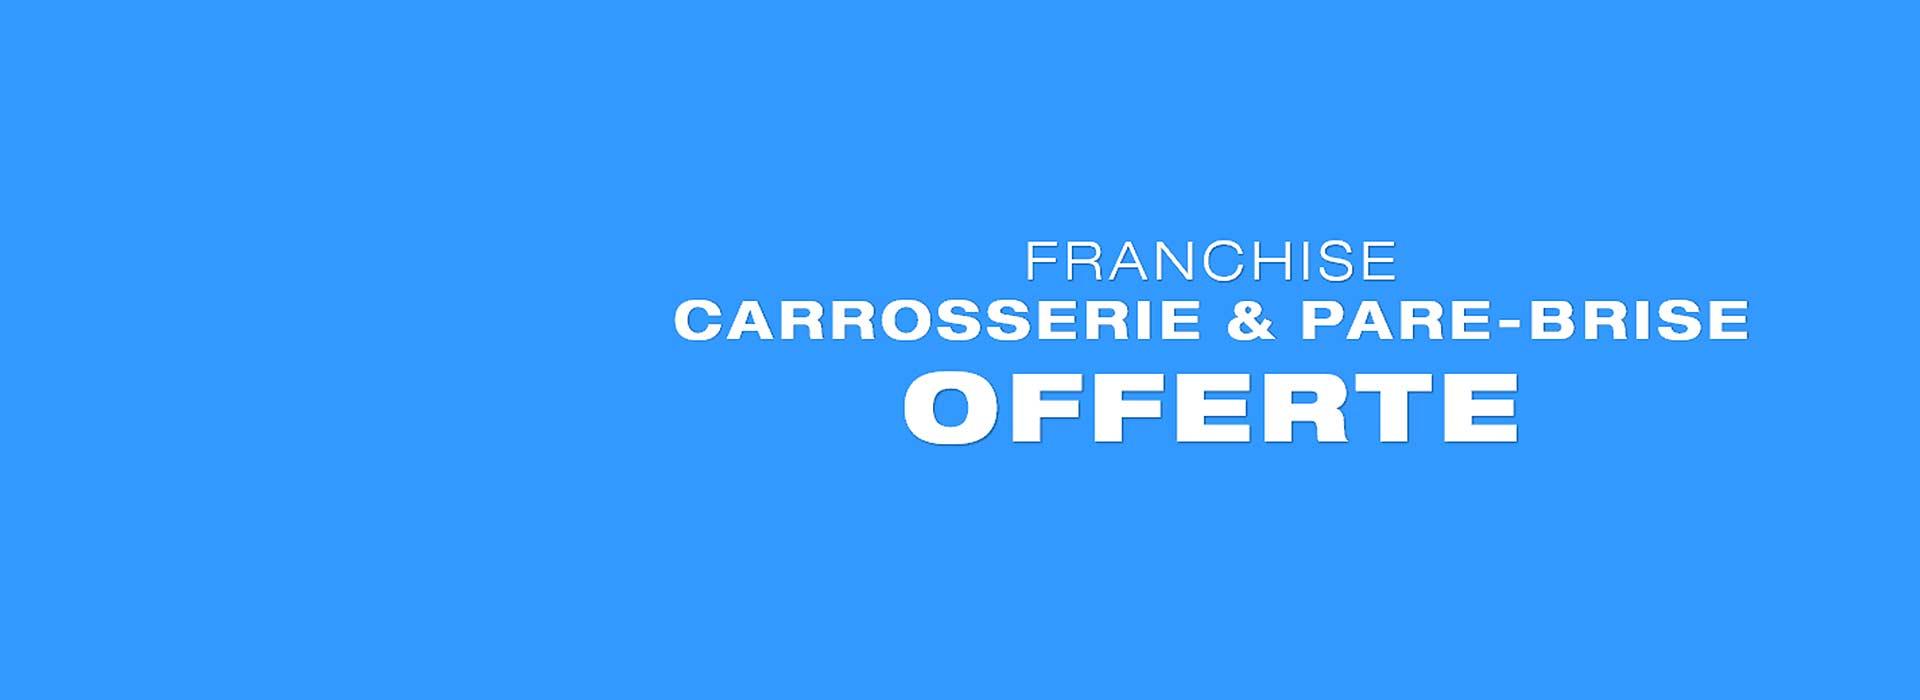 OFFRE FRANCHISE